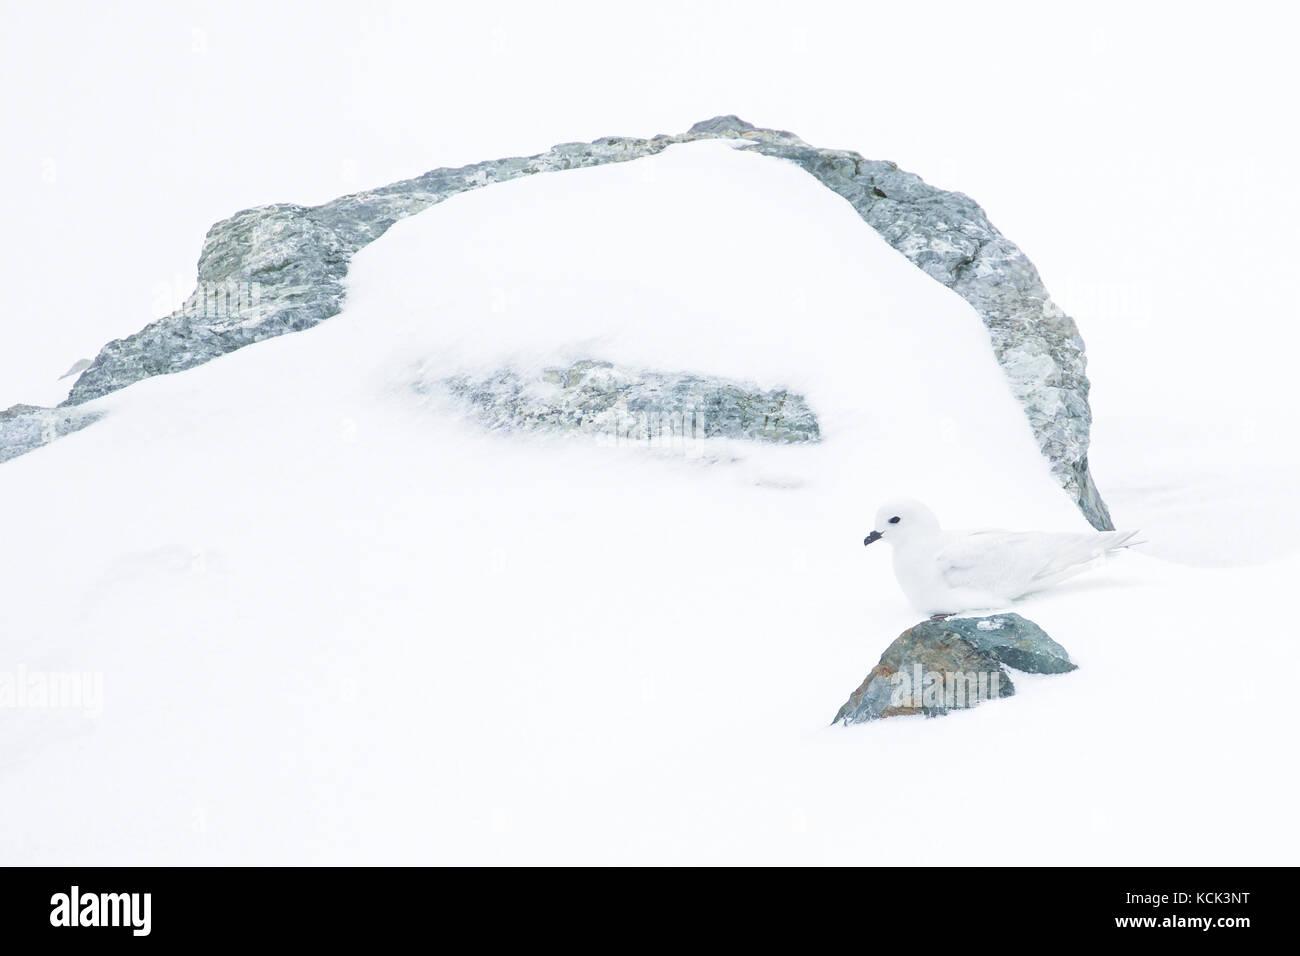 Snow Petrel (Pagodroma nivea) on snow on South Georgia Island - Stock Image